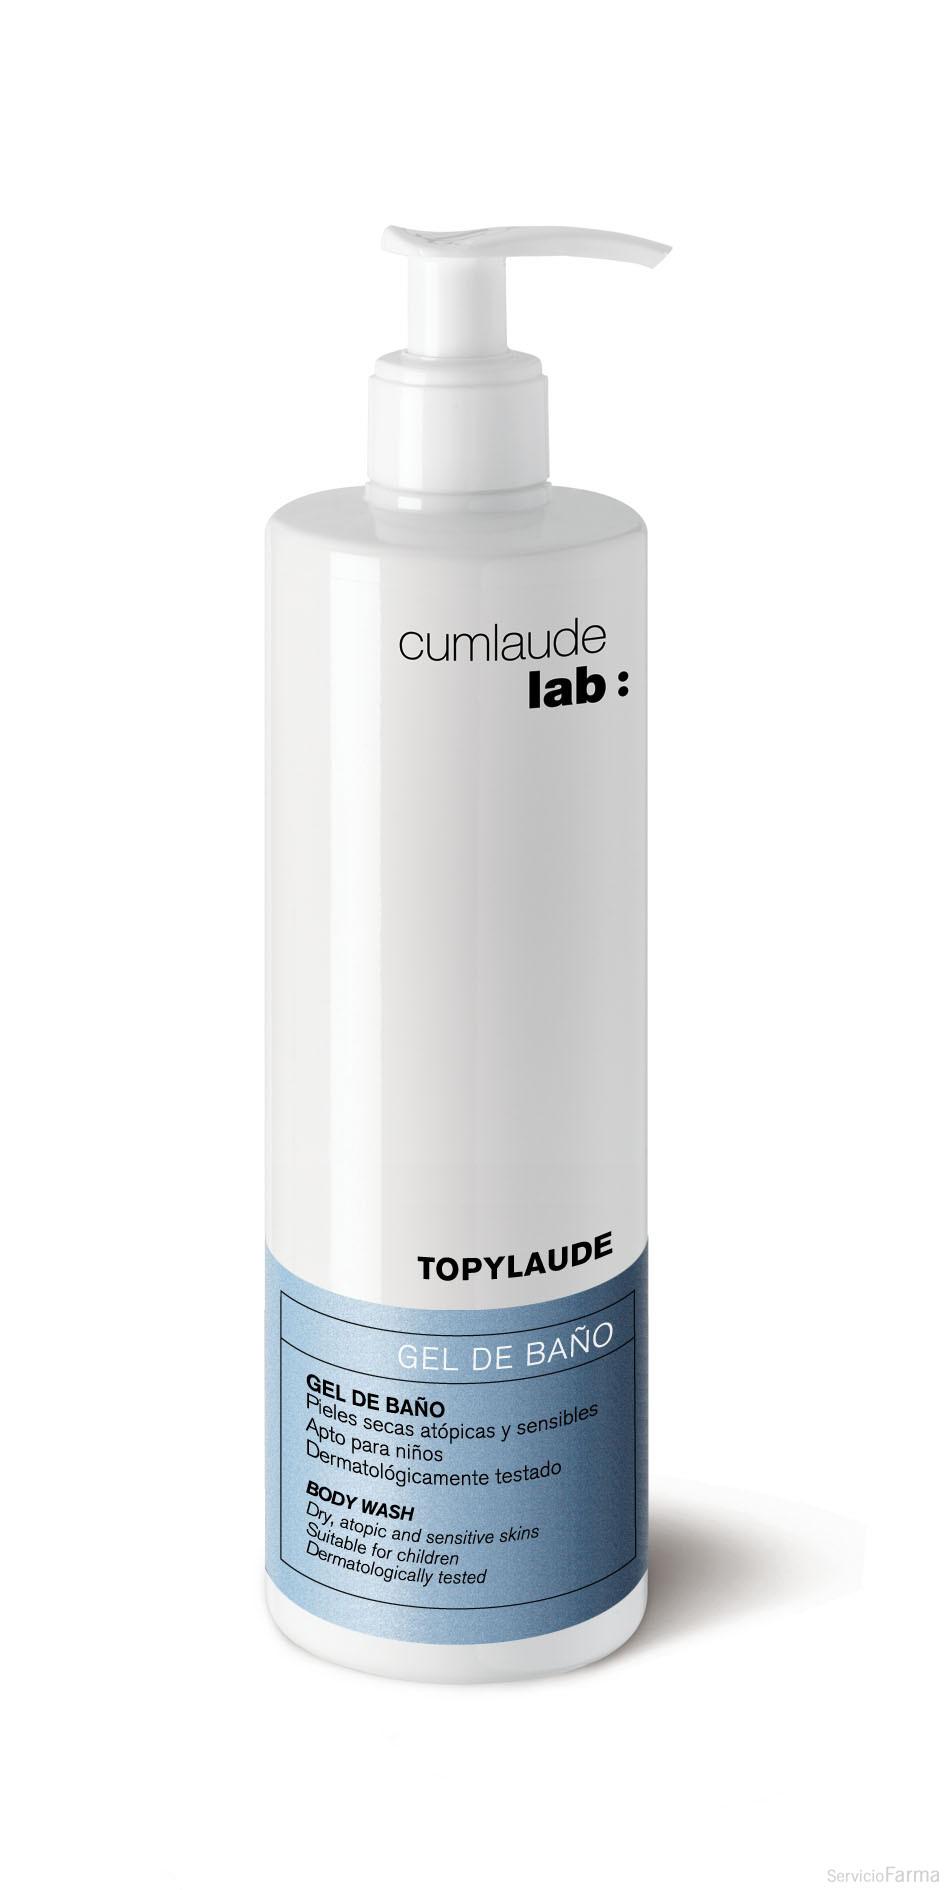 Cumlaude TOPYLAUDE Gel de Baño 400 ml